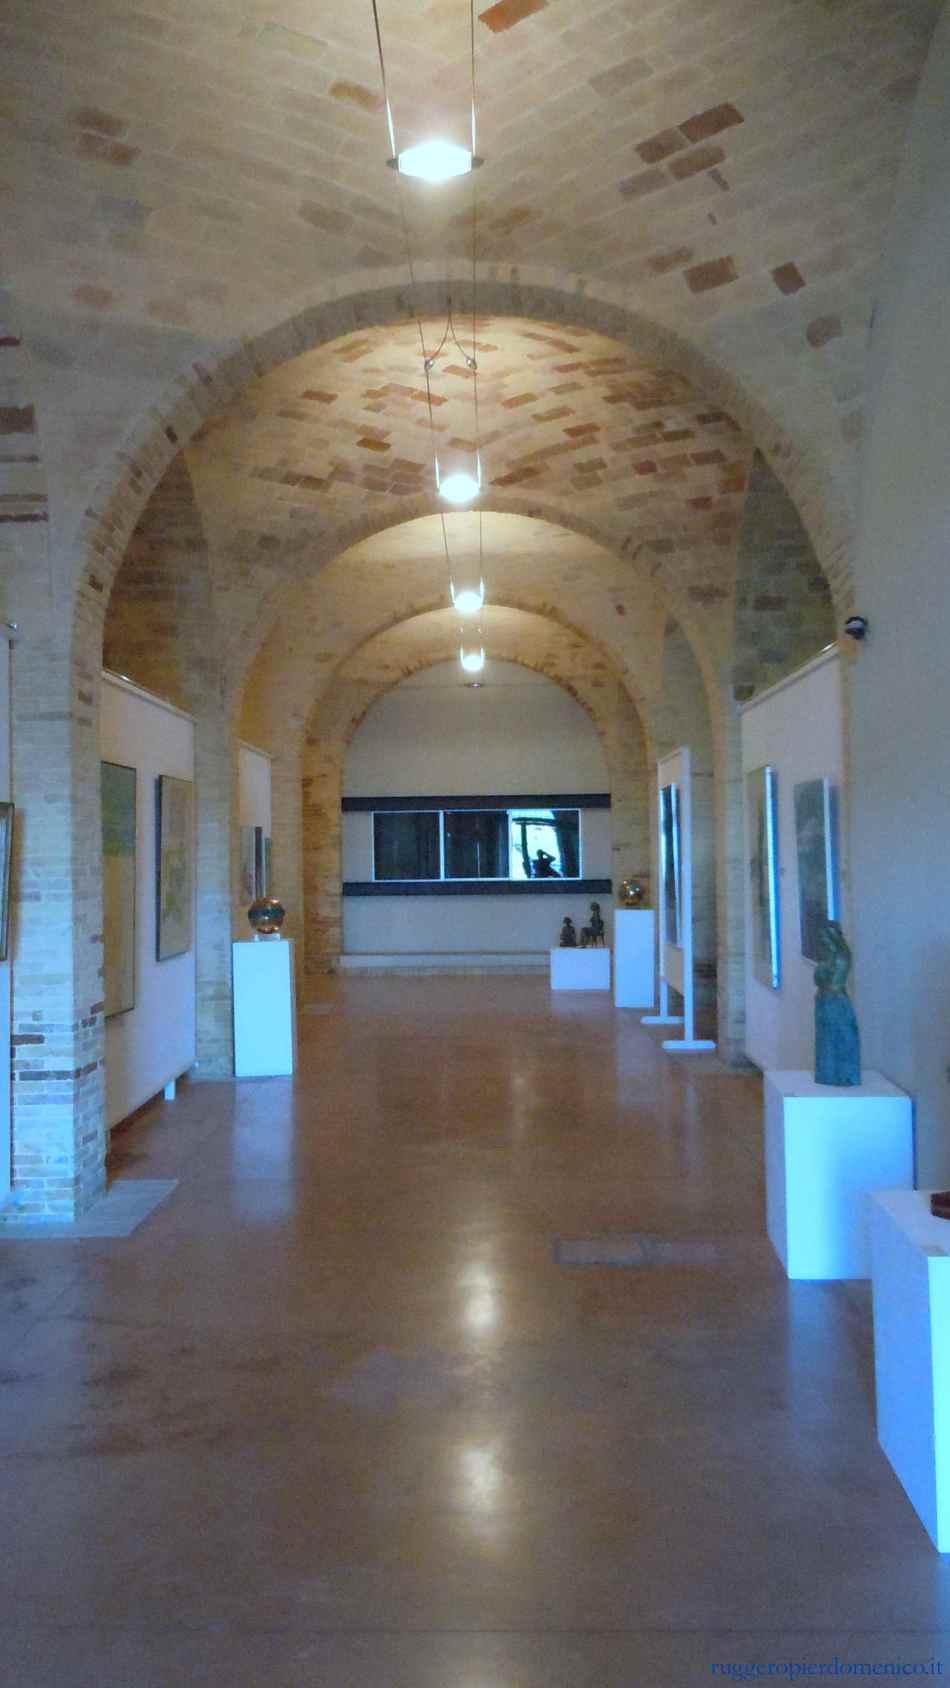 Vasto , Scuderie palazzo d'Aragona, 2014 (ruggeropierdomenico.it)